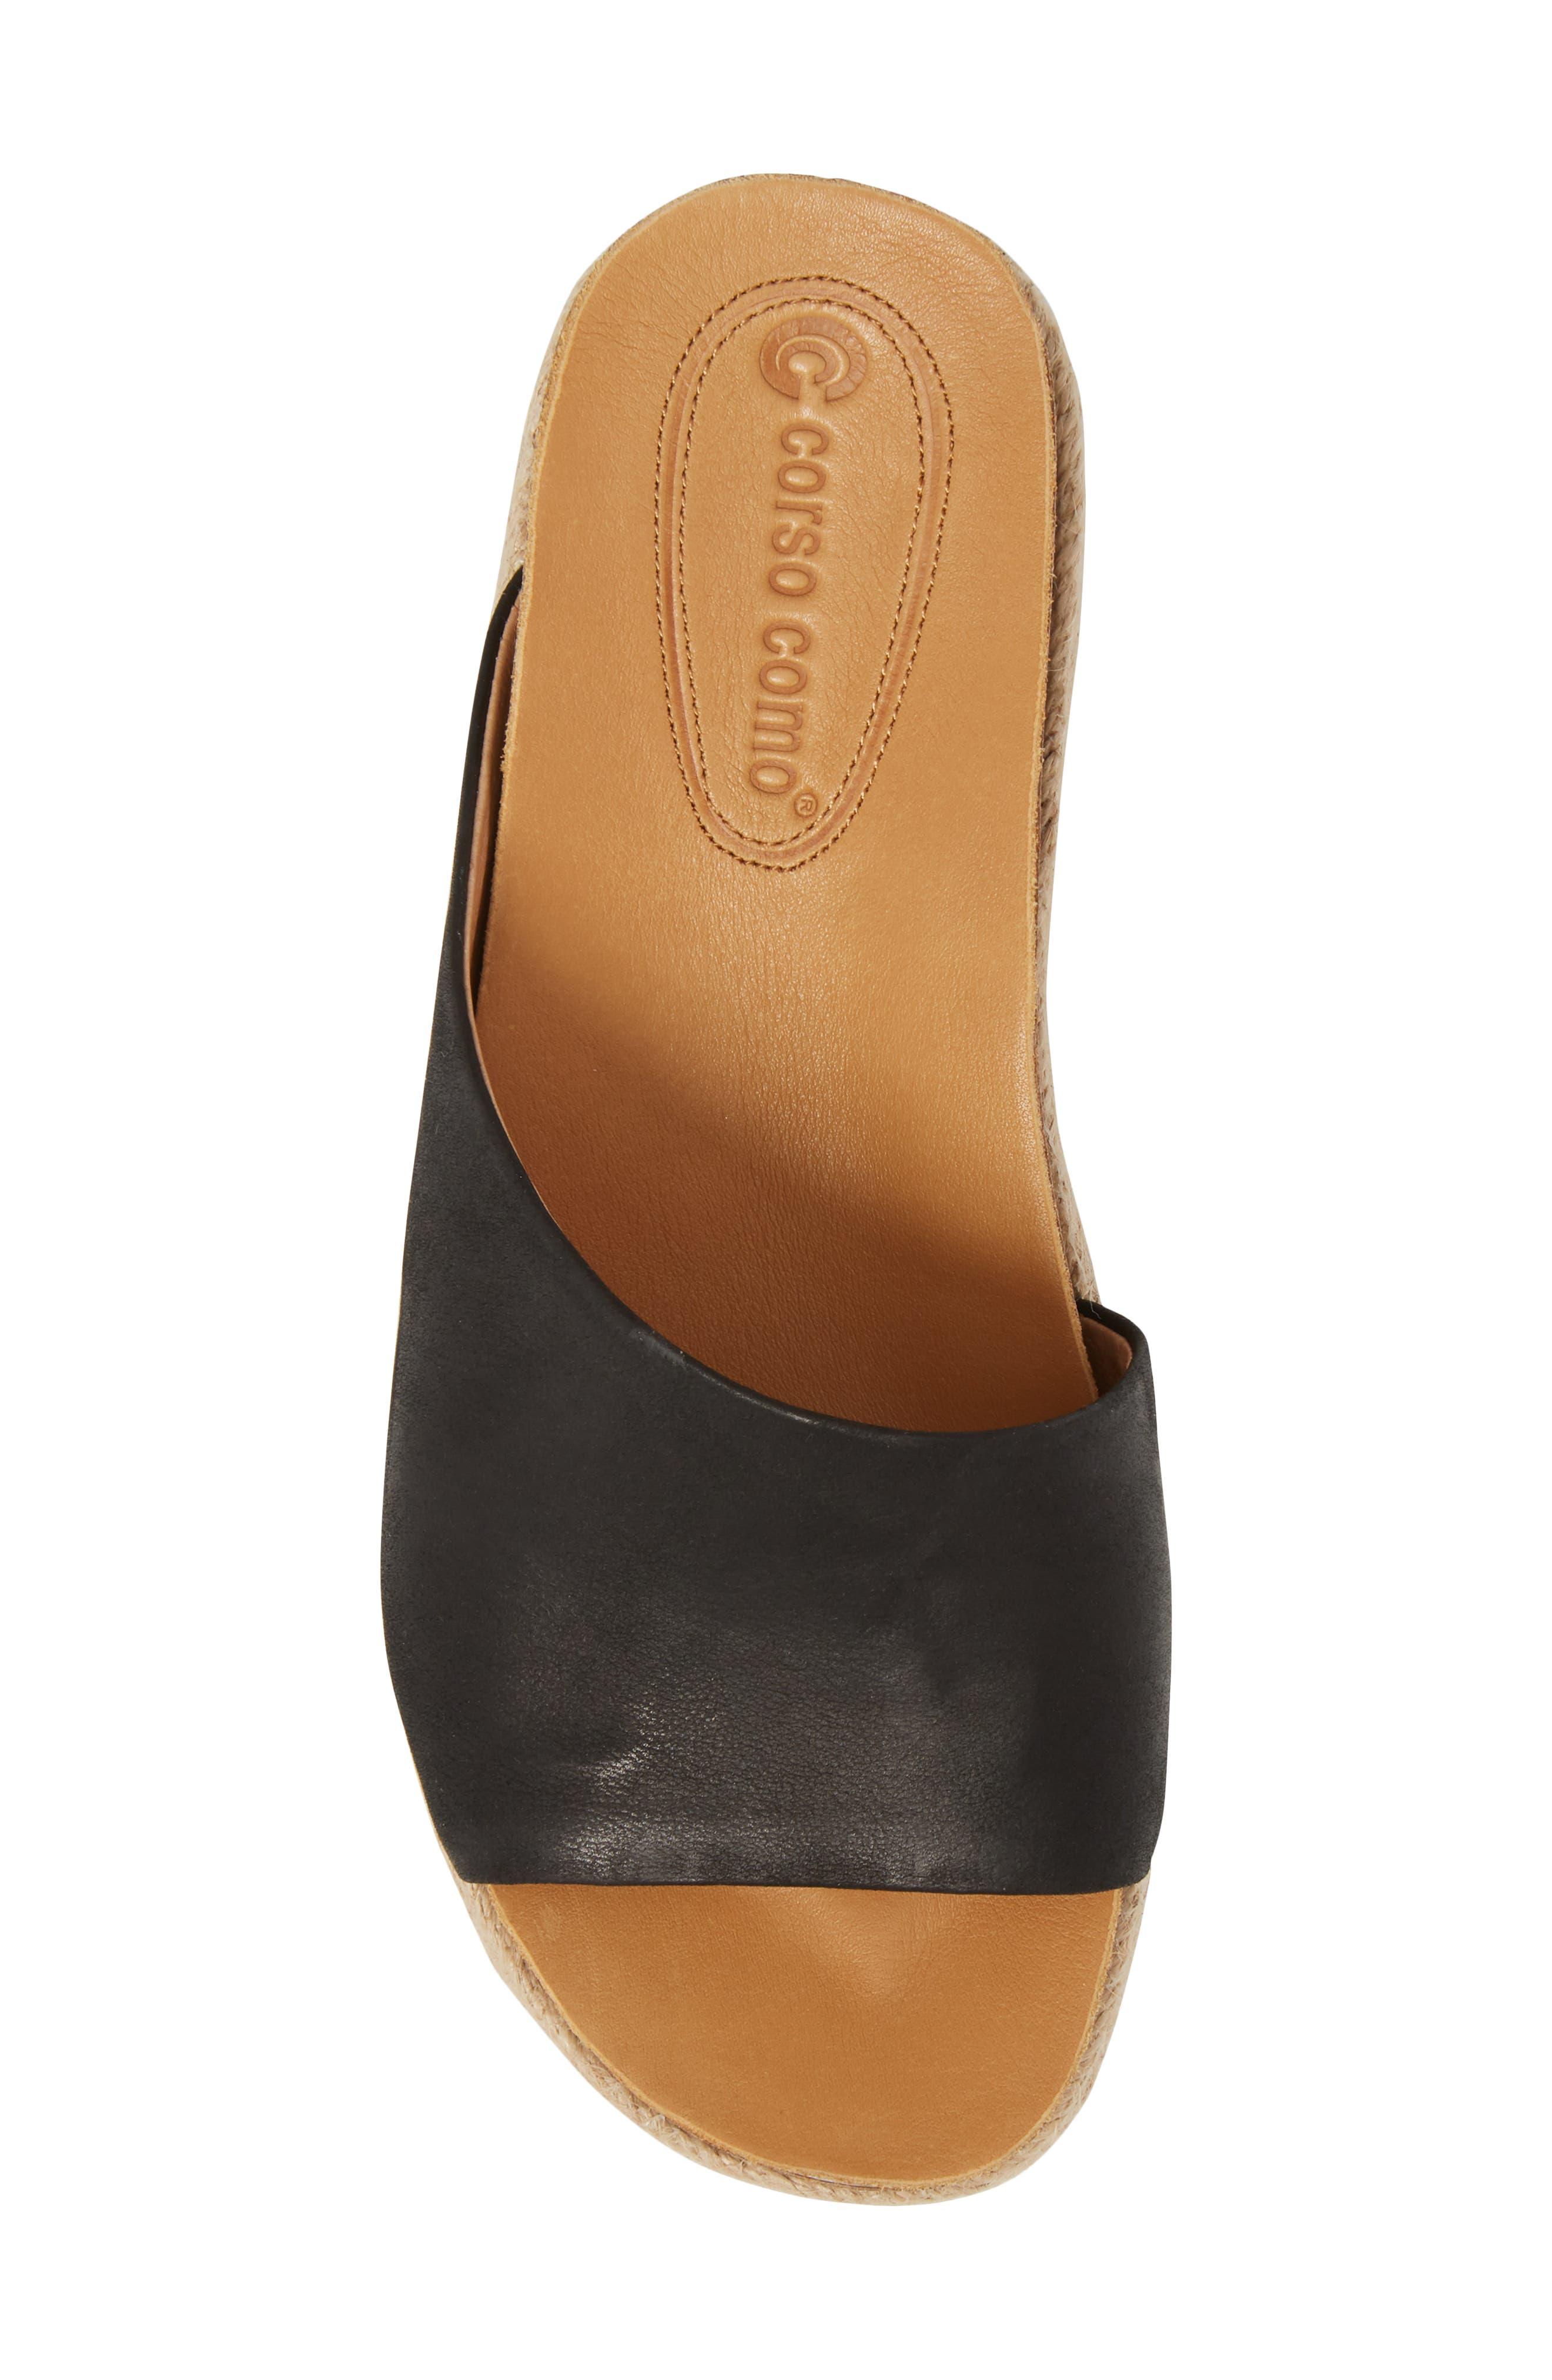 Candice Sandal,                             Alternate thumbnail 5, color,                             Black Leather